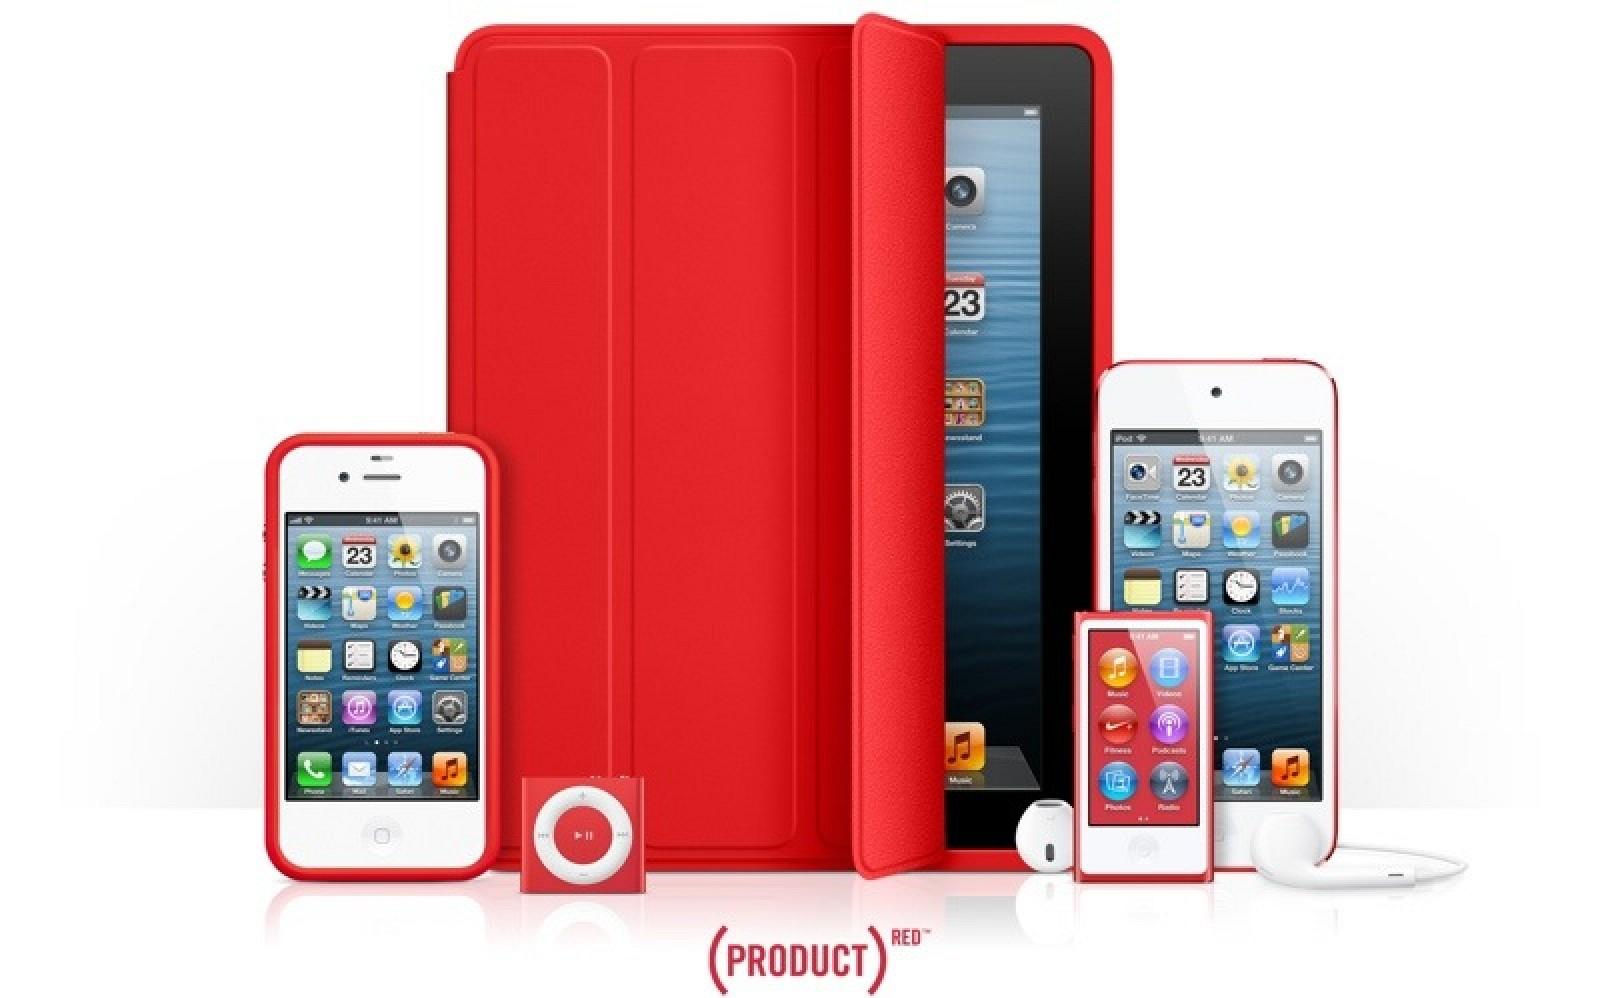 Apples Product Red Charity Contributions Reach 70 Million Erapod Iphone Ipad Mac Macrumors